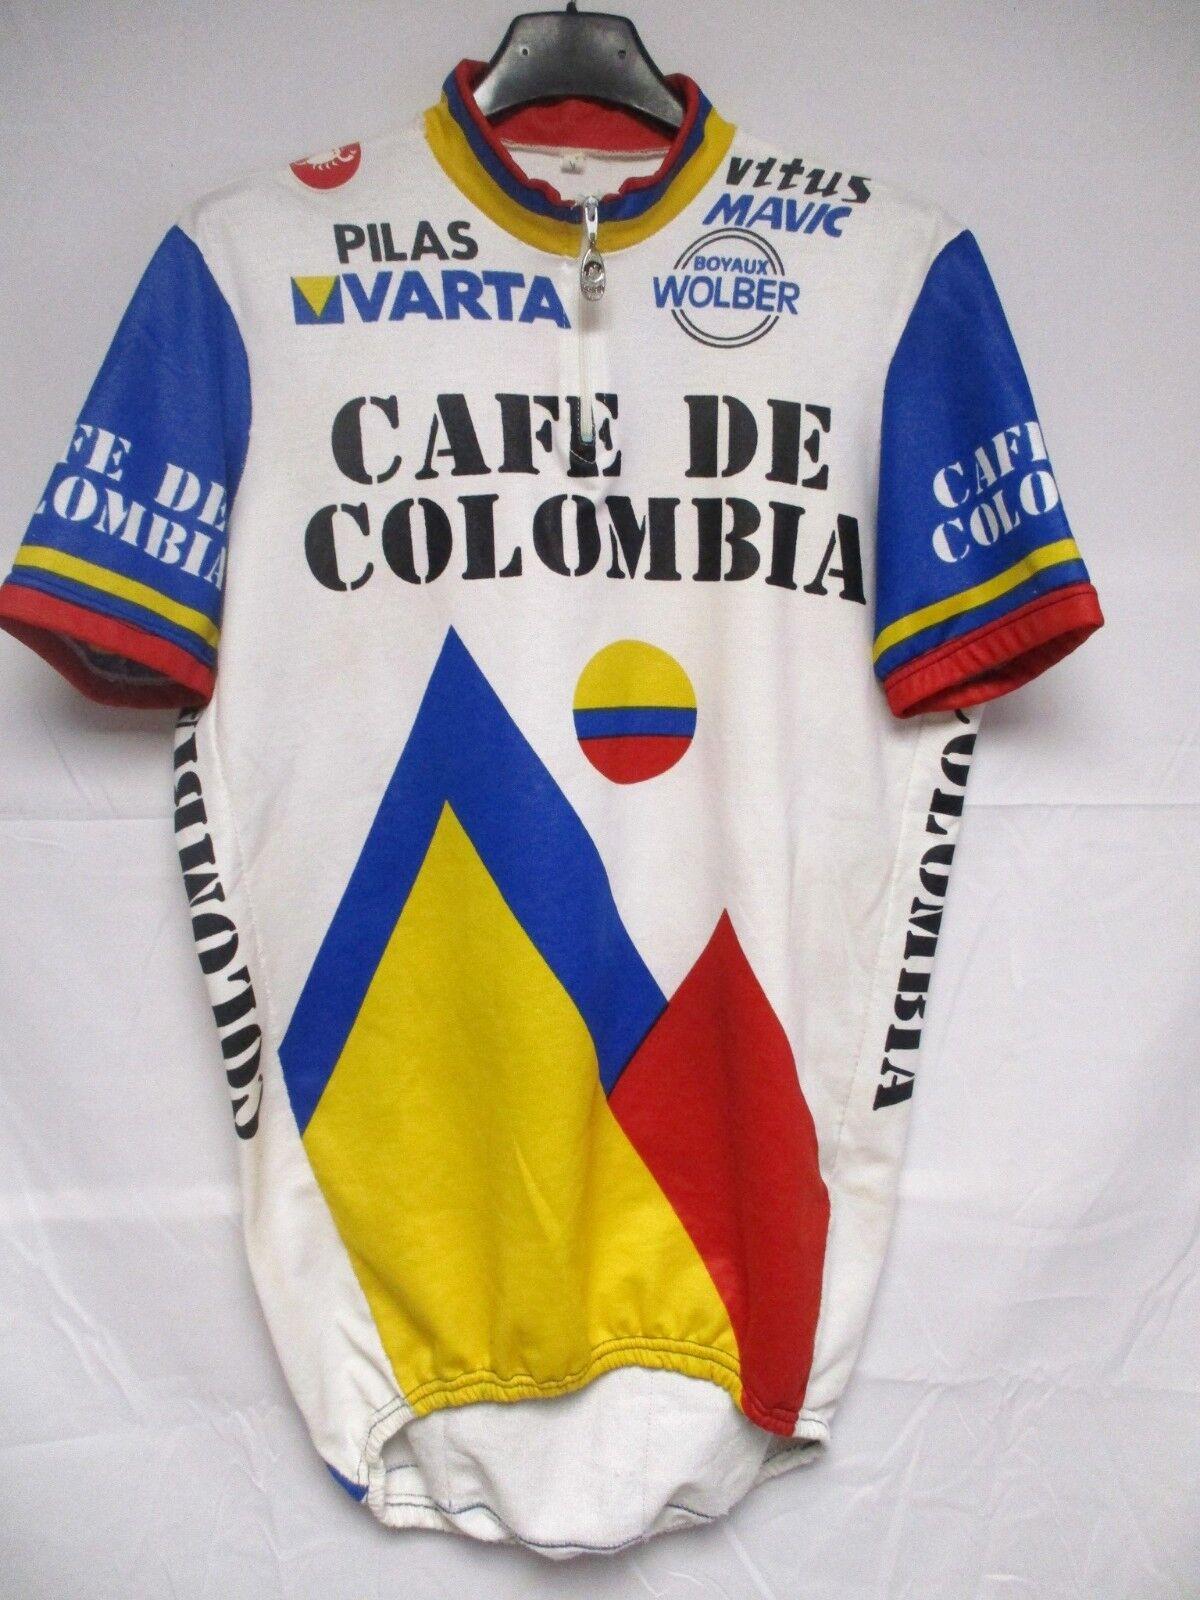 Maillot cycliste CAFÉ DE COLOMBIA VARTA vintage 1986 camiseta jersey shirt 6 XXL